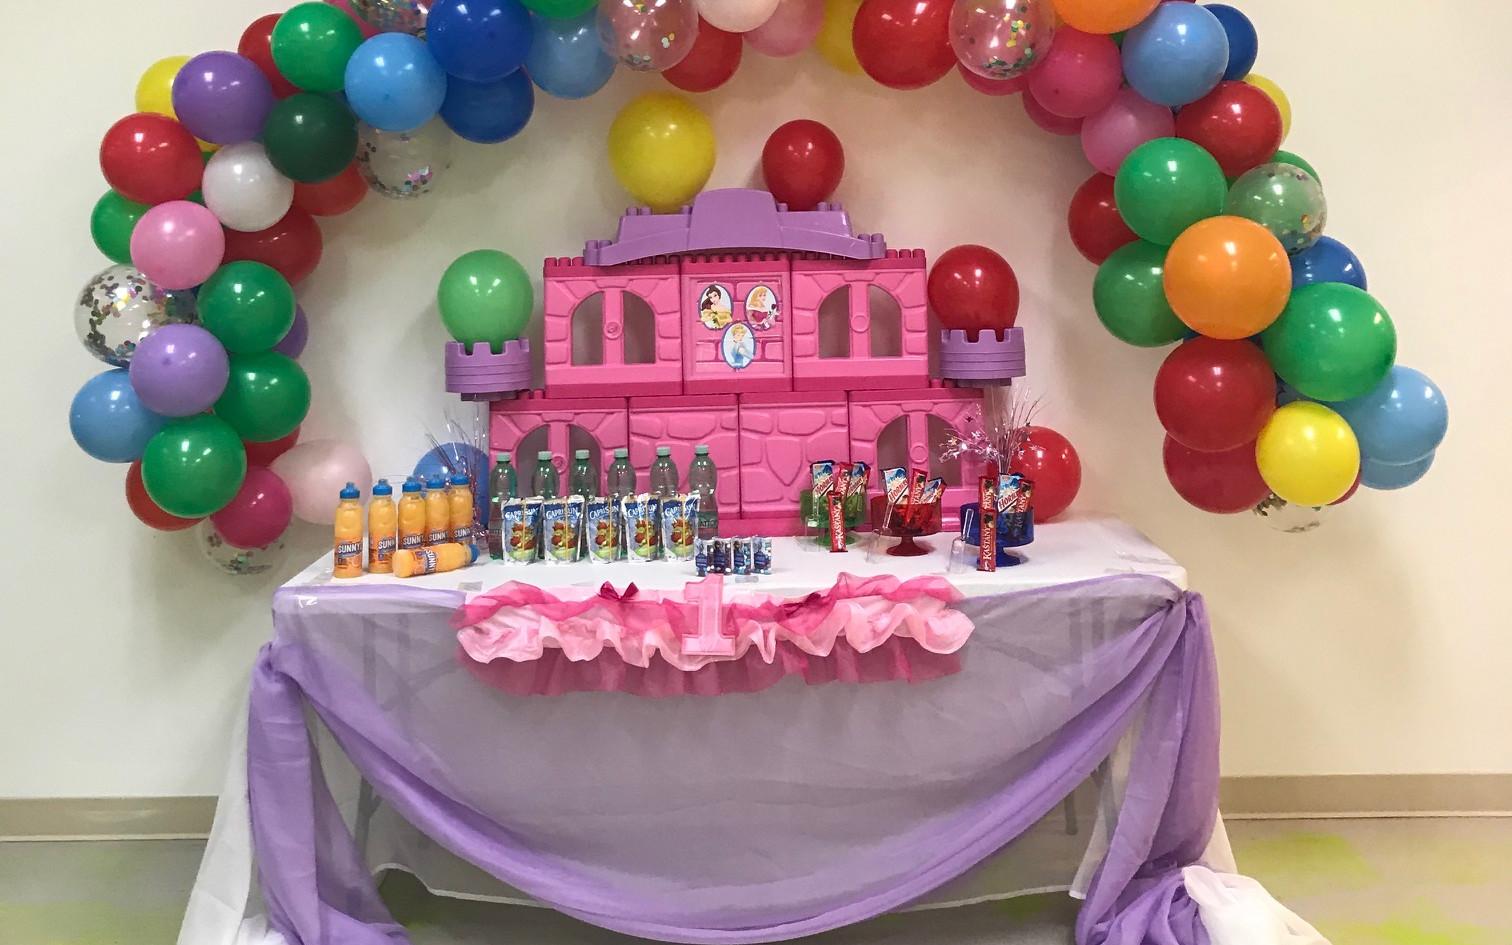 nellys-playground-toddlers-birthday-spac